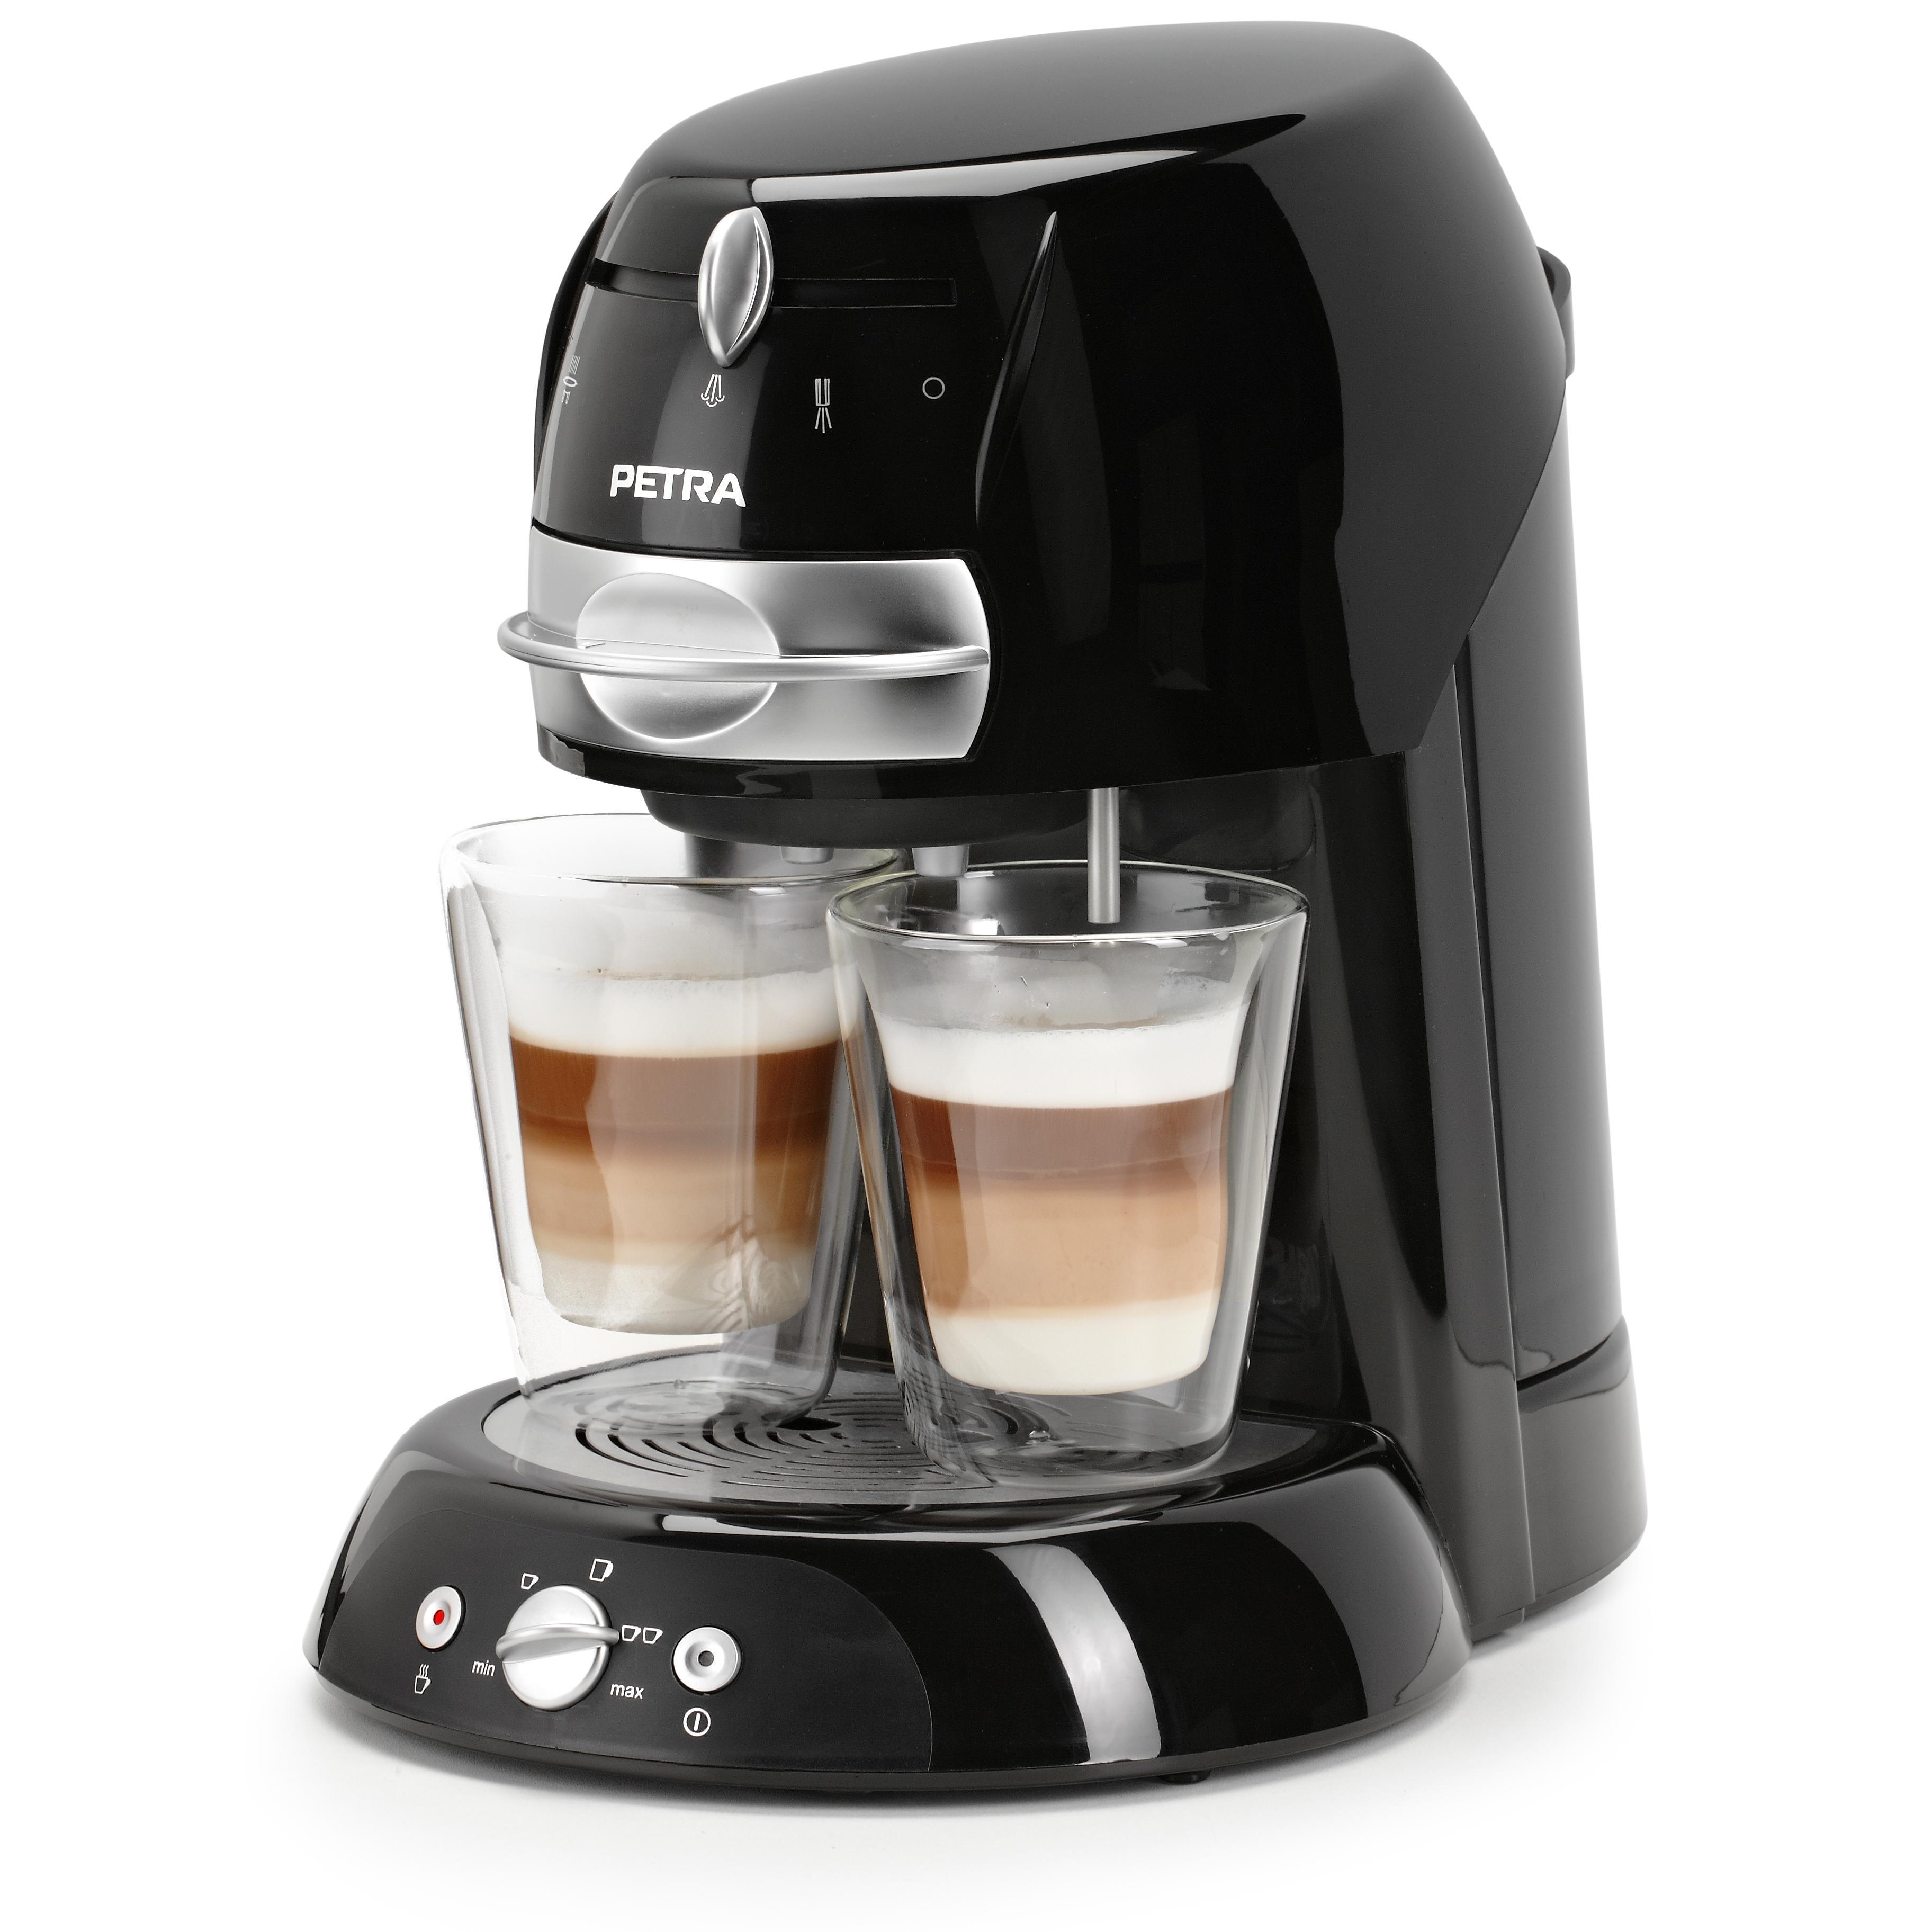 petra electric km kaffeepadmaschine artenso latte mit milchaufsch umer ebay. Black Bedroom Furniture Sets. Home Design Ideas